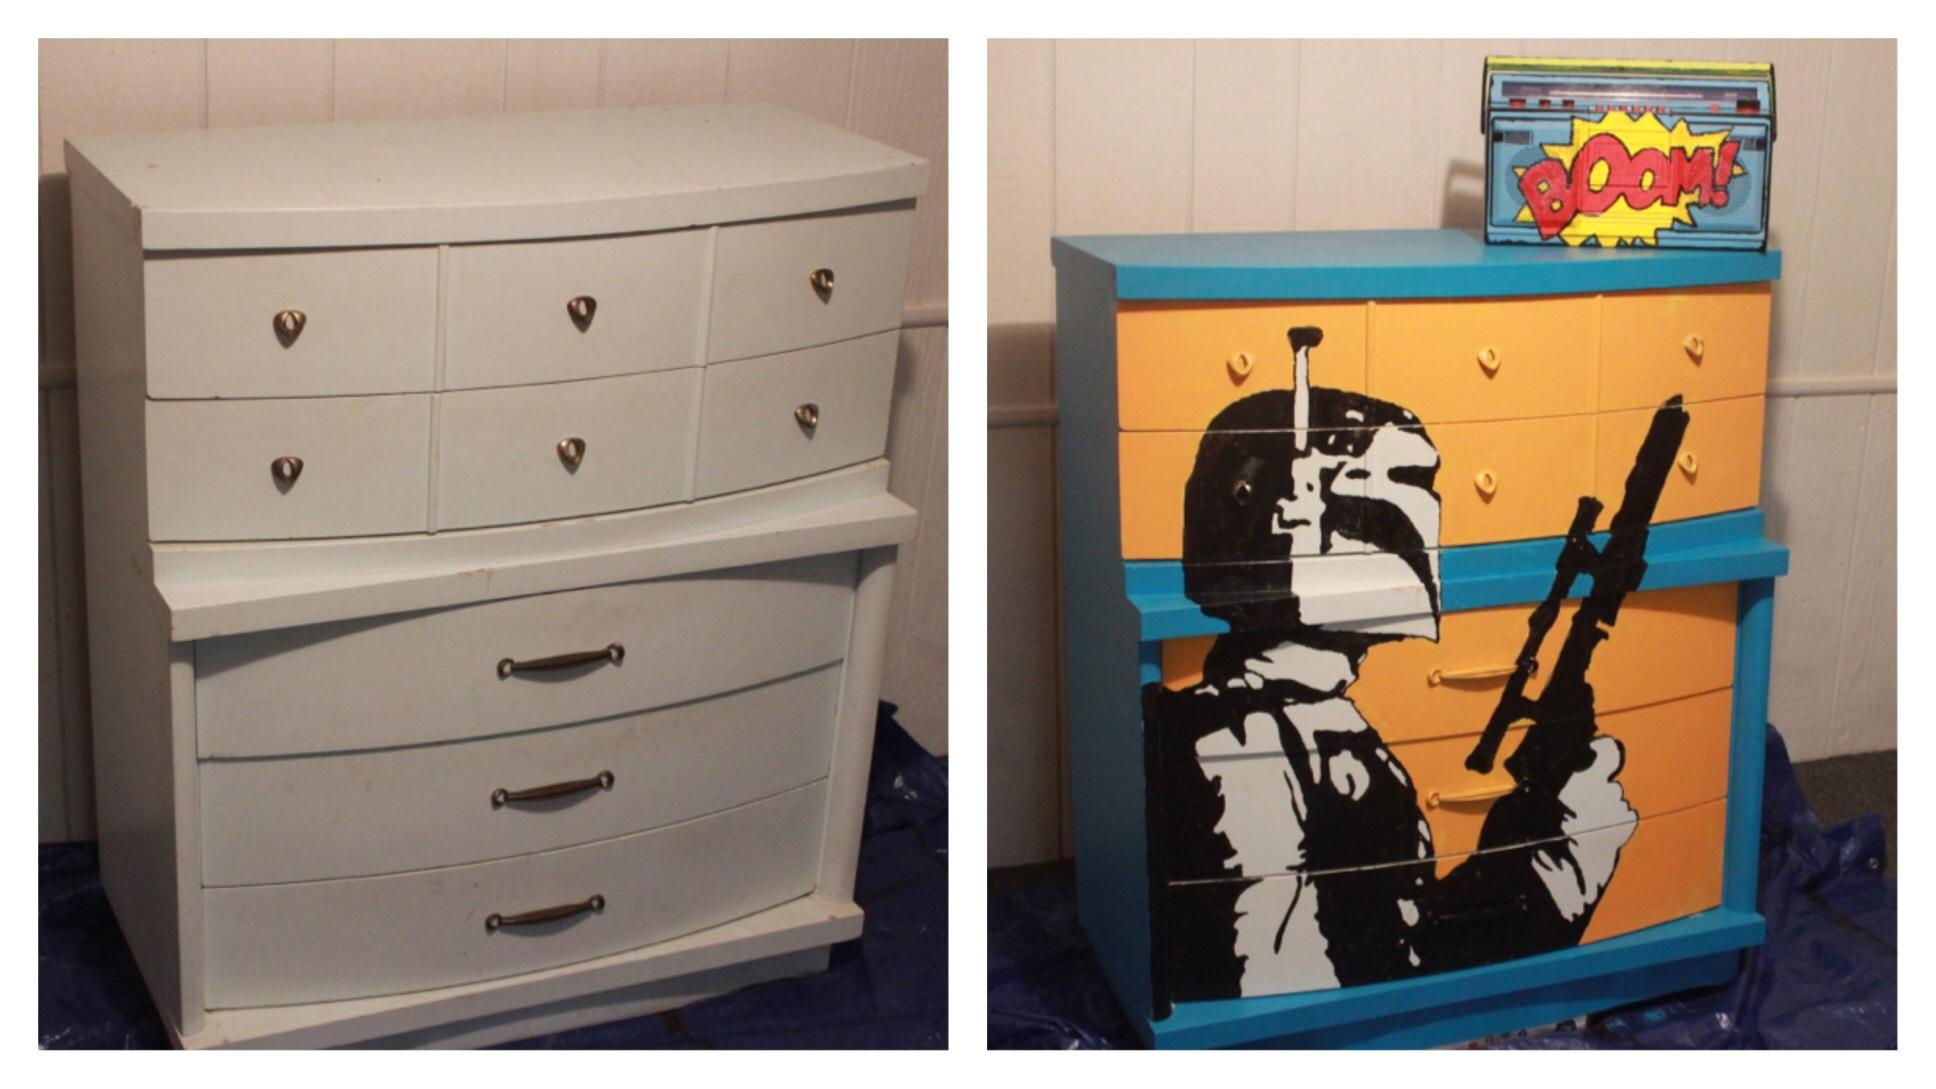 Cool dresser upgrade and boom box